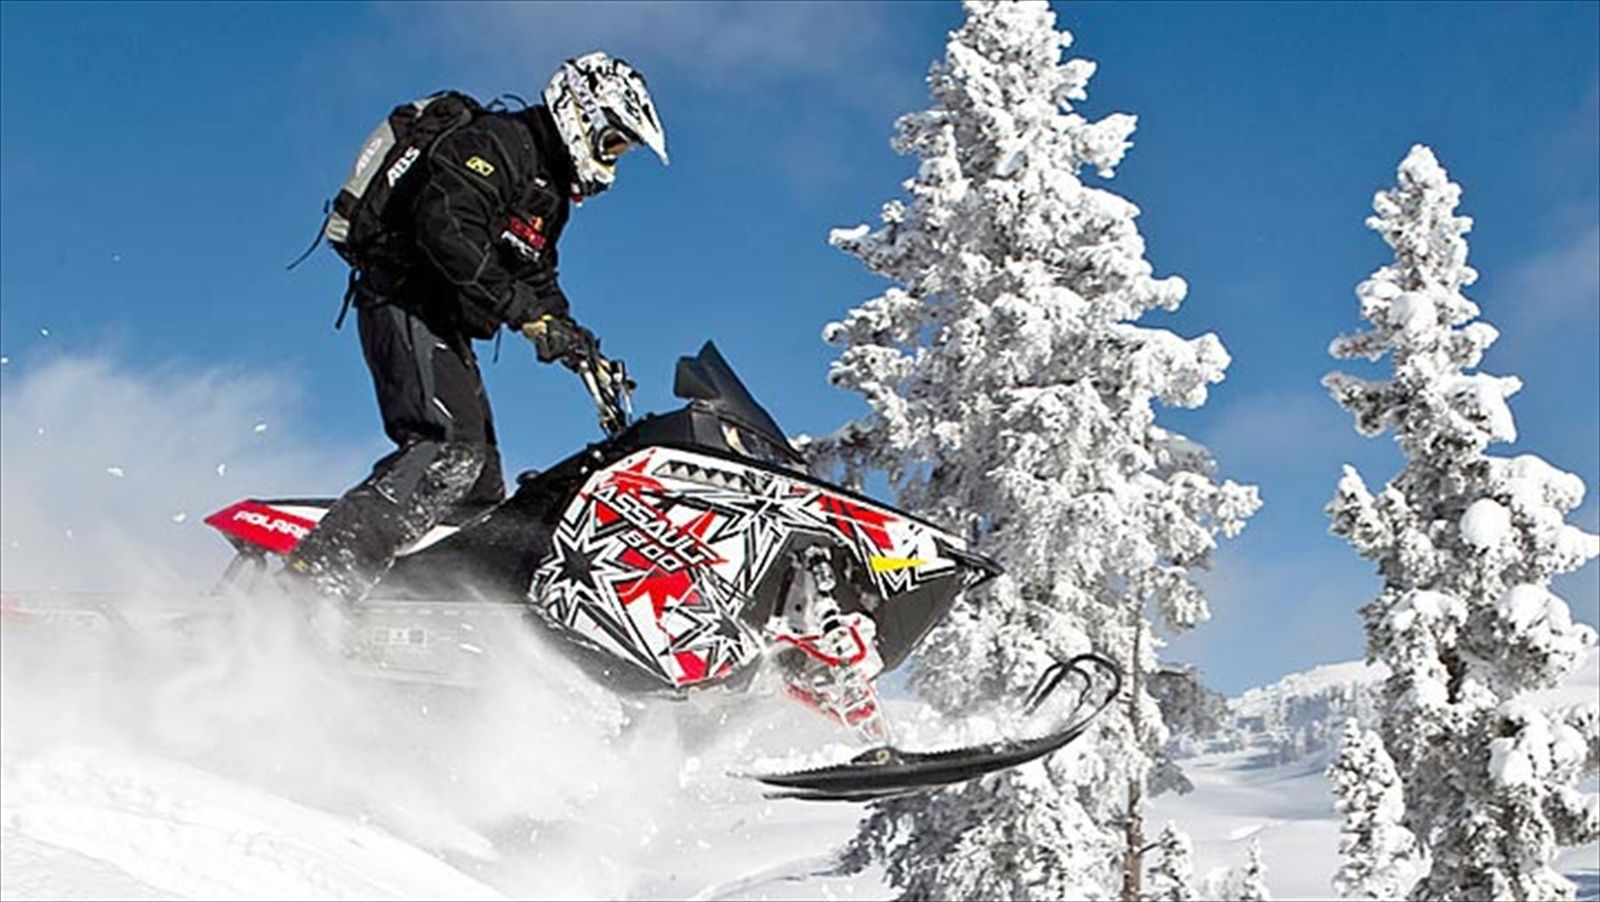 Polaris Snowmobile Wallpaper | 800 RMK Assault 155 5 300x300 2012 Polaris 800 RMK ASSAULT 155